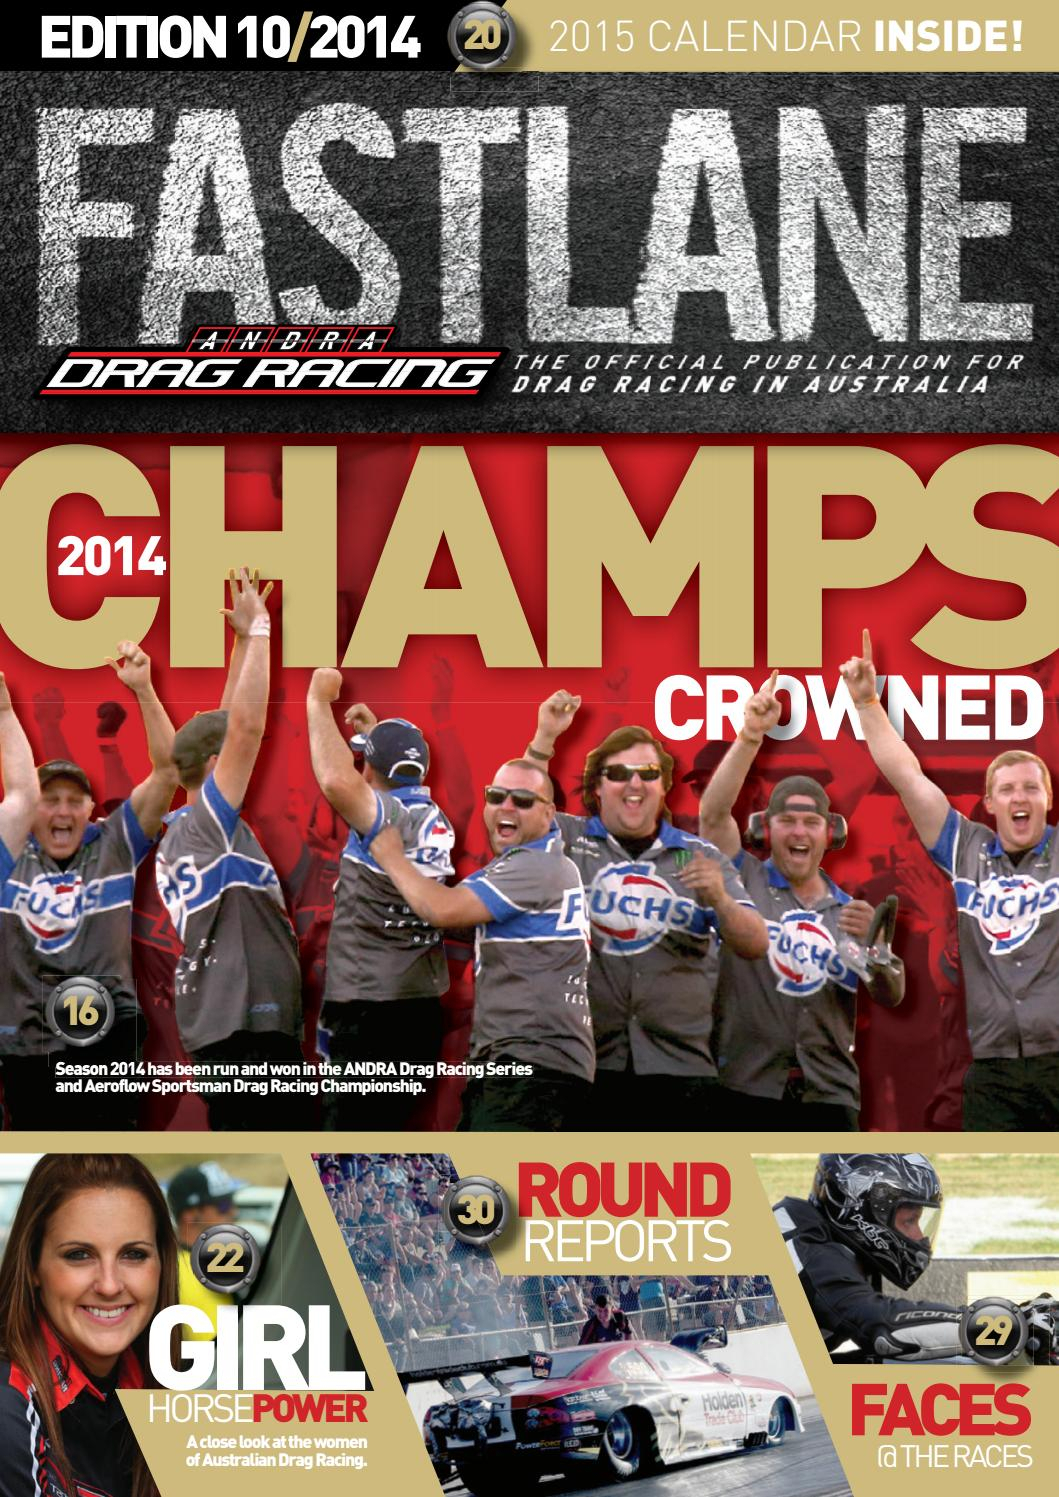 Fastlane Magazine  Issue 10 By Andra Drag Racing  Issuu regarding Benaraby Raceway Calendar